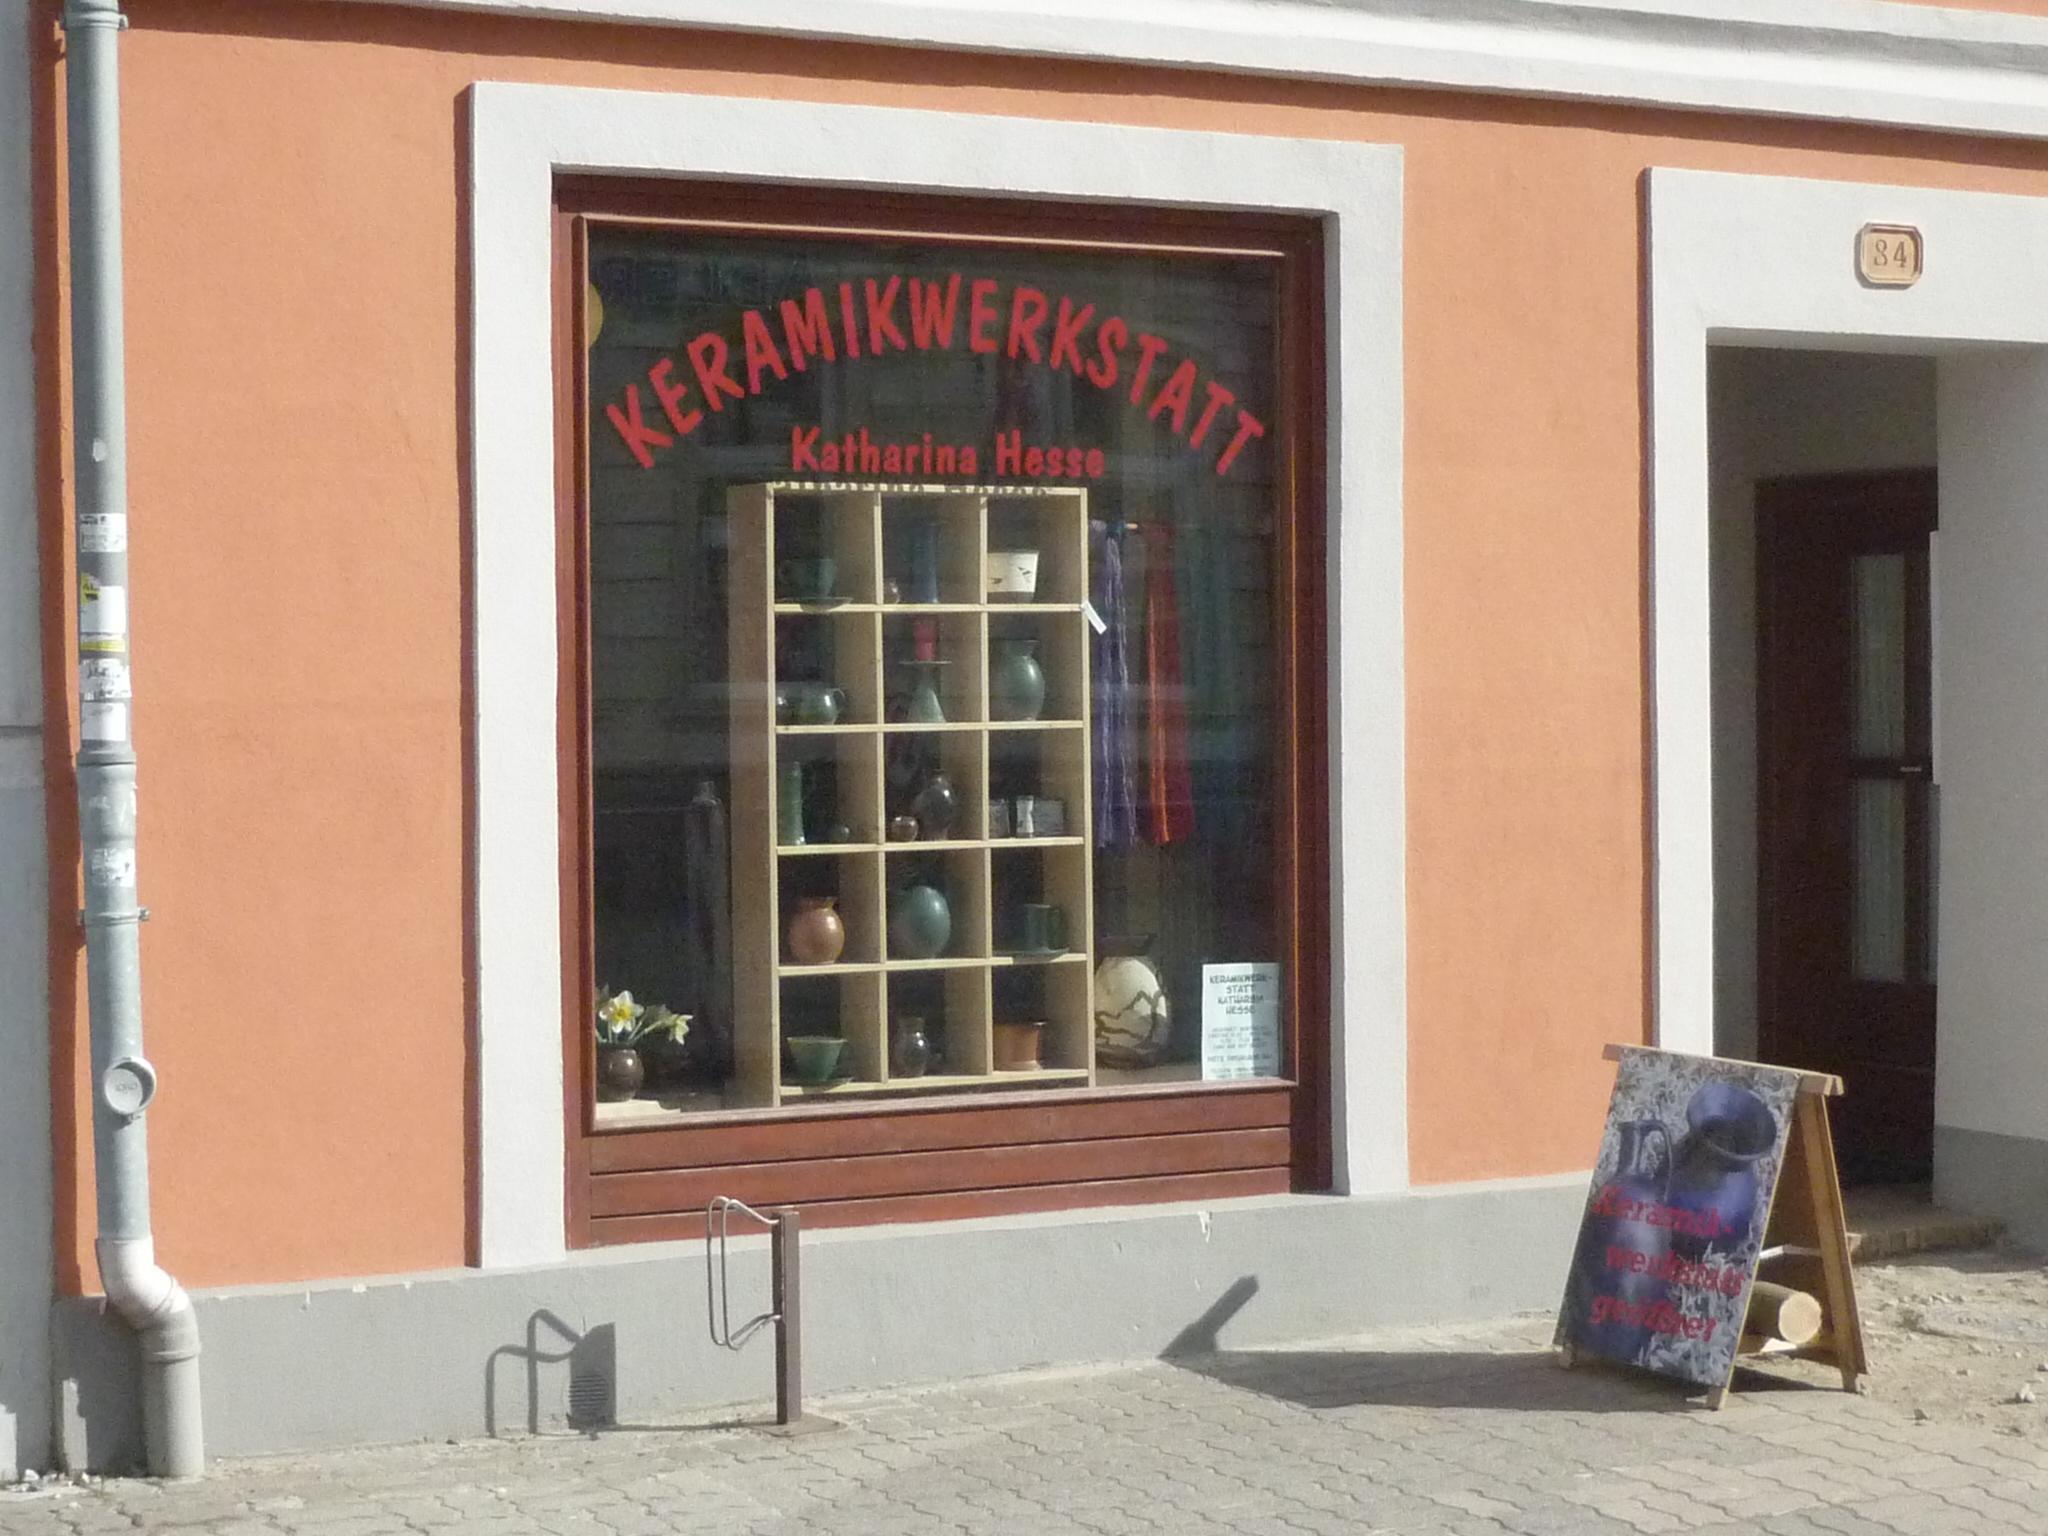 Keramikwerkstatt katharina hesse